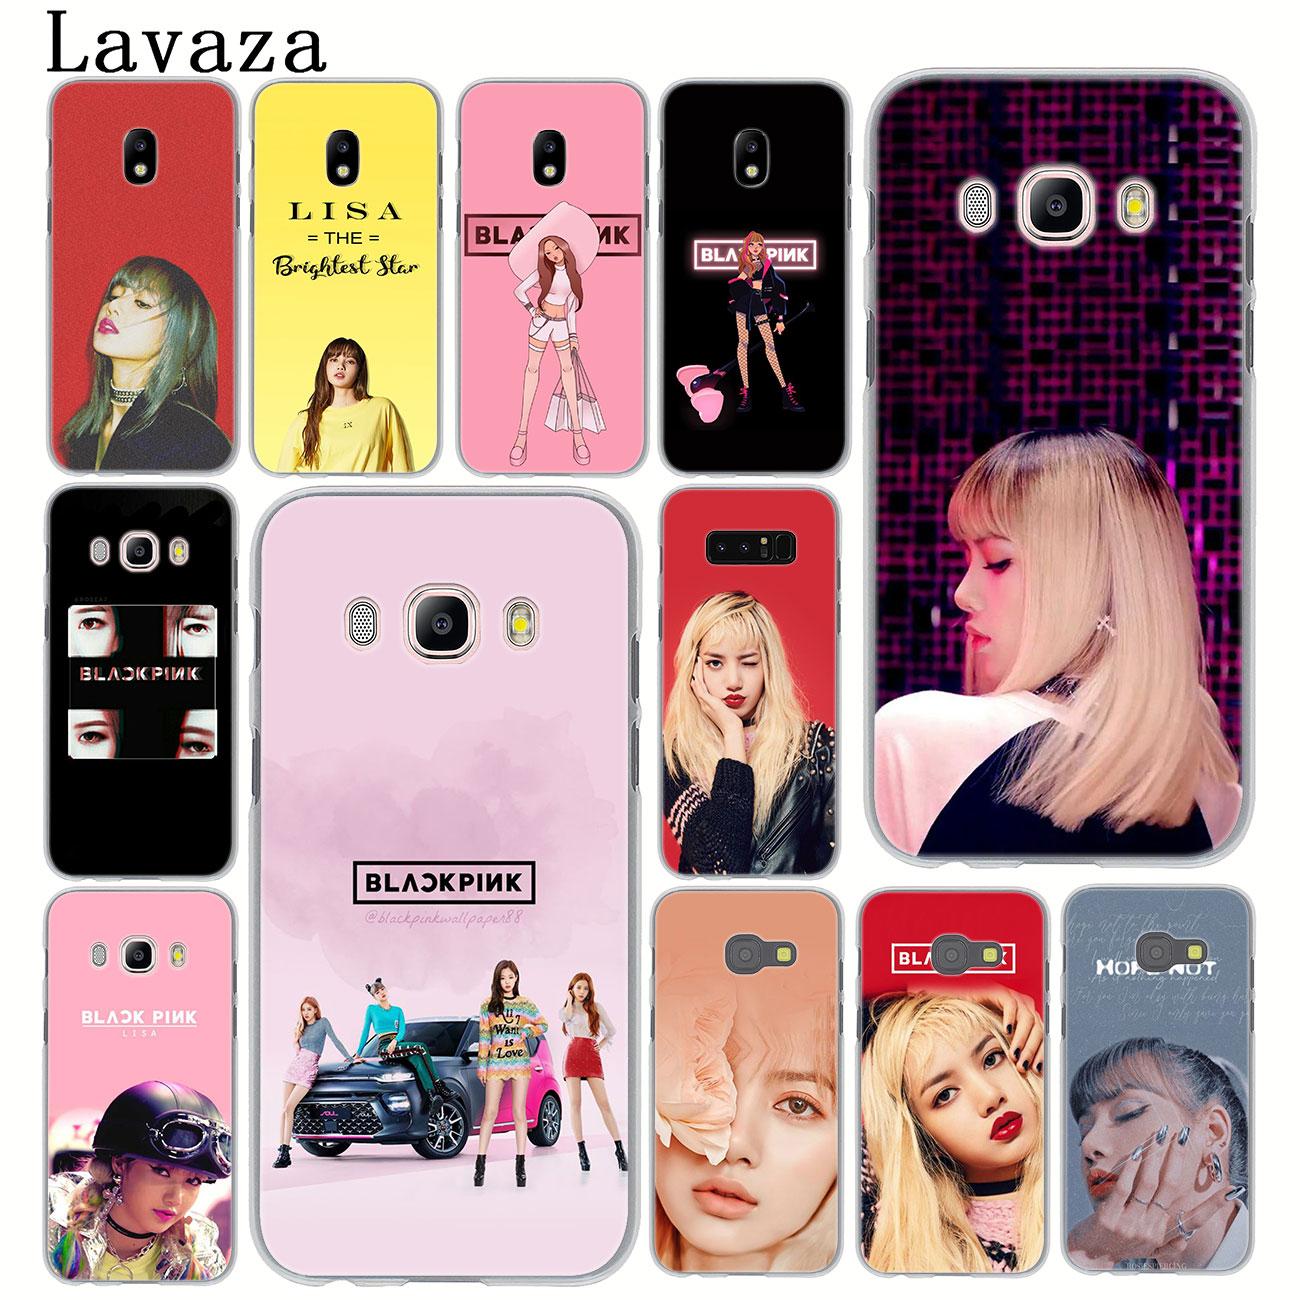 Lavaza BLACKPINK lisa caso de teléfono para Samsung Galaxy J8 J7 Duo J4 J5 J6 Plus 2018 de 2017 de 2016 J2 J3 primer 2015 cubierta